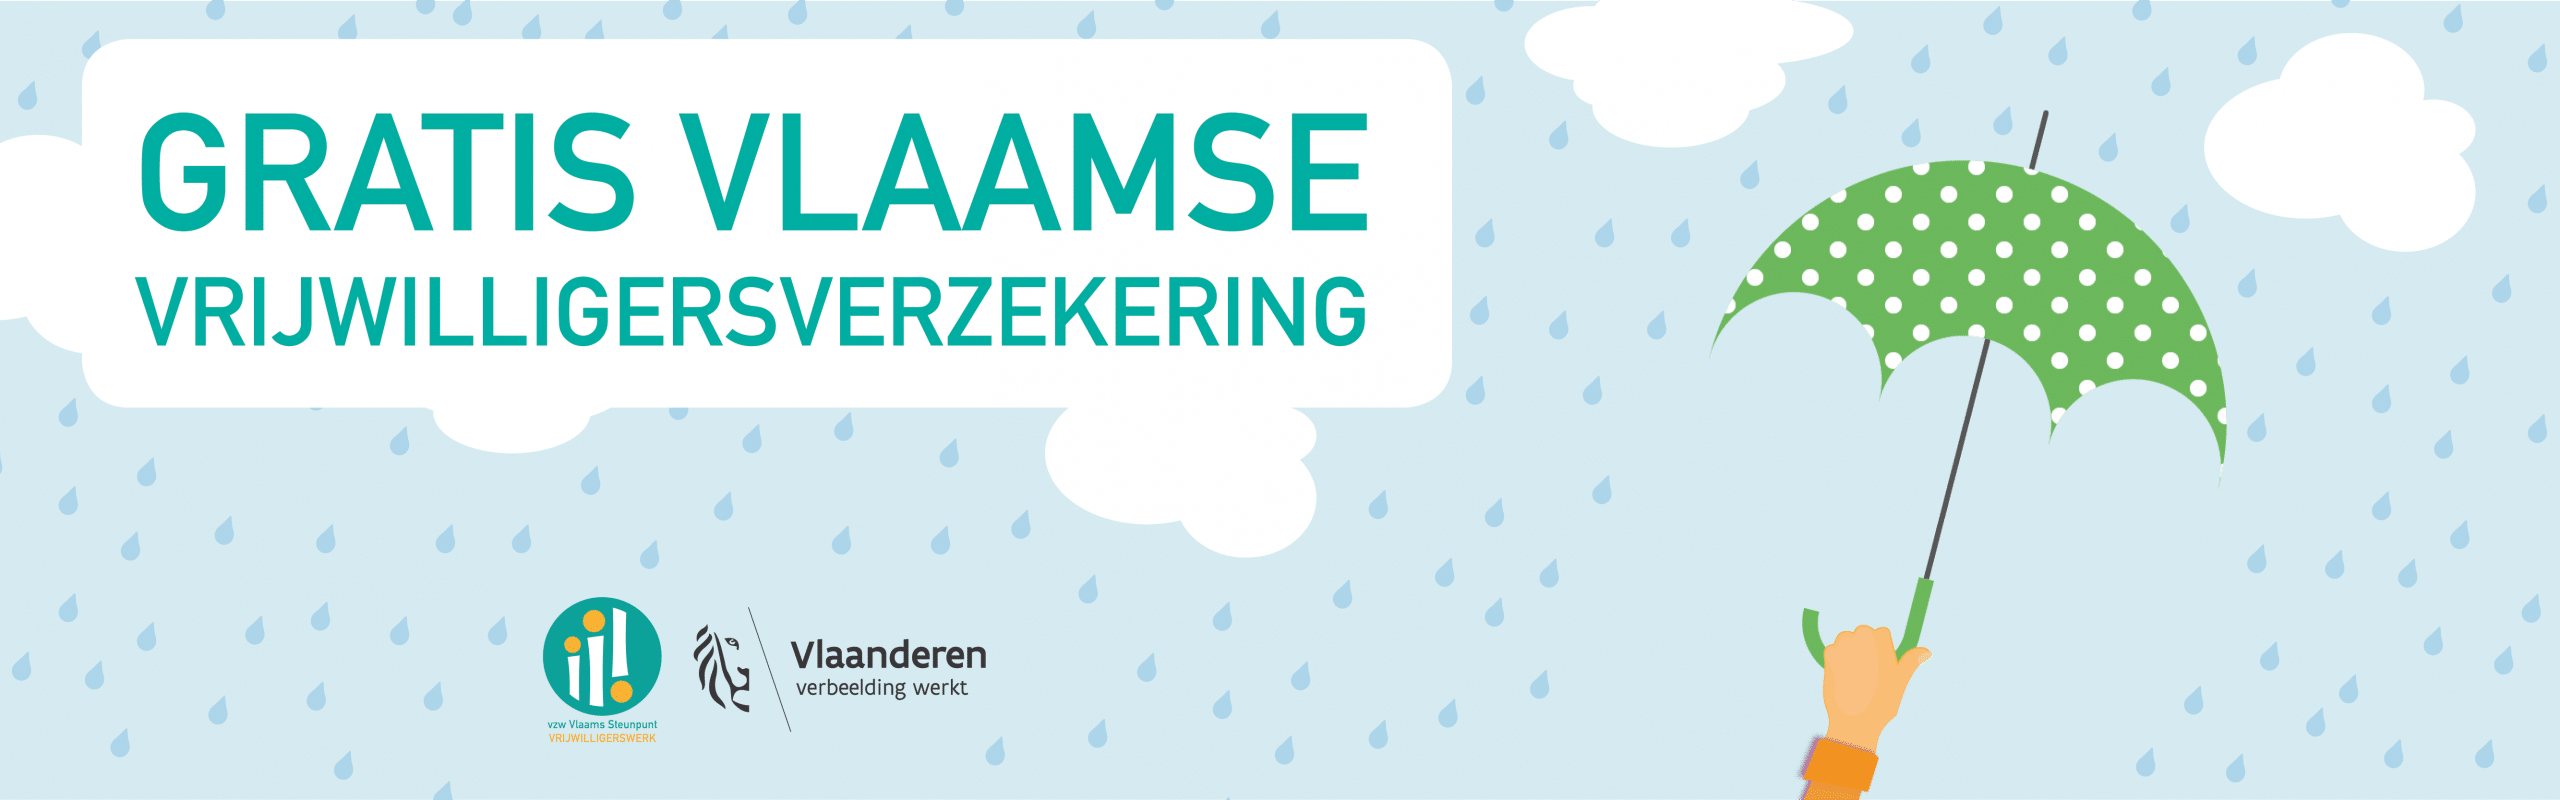 Vlaams Steunpunt Vrijwilligerswerk